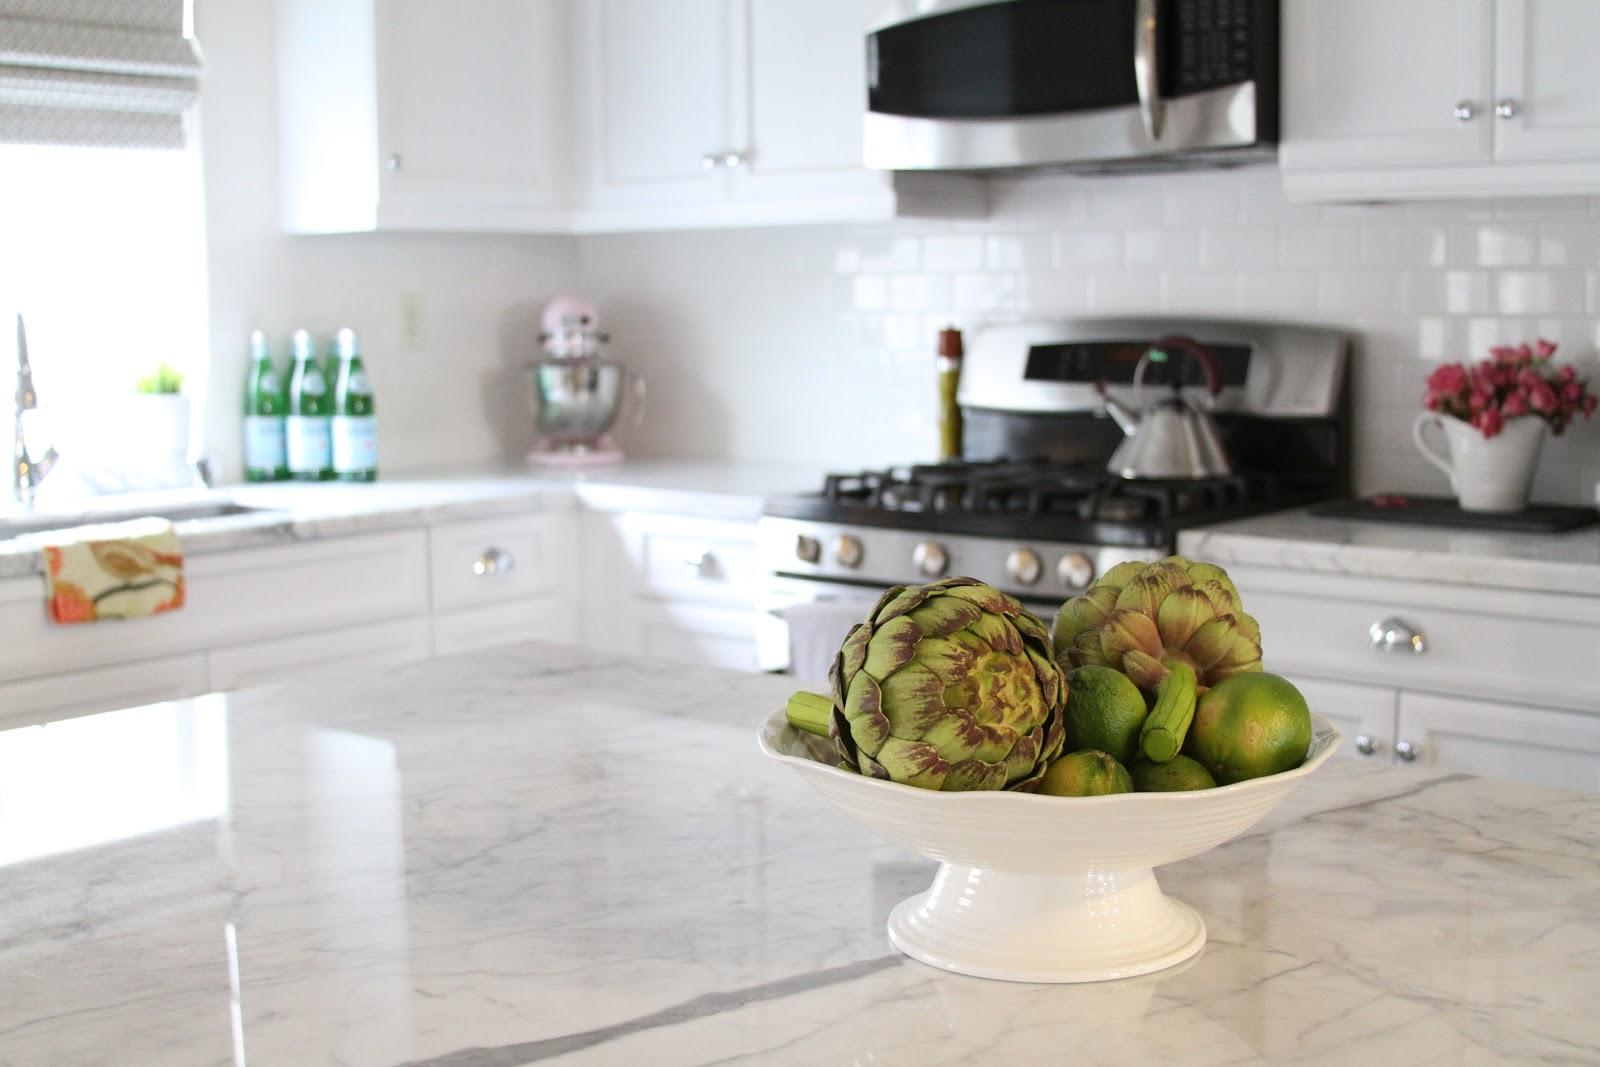 Decorgreat: FINALLY! My Kitchen Reveal